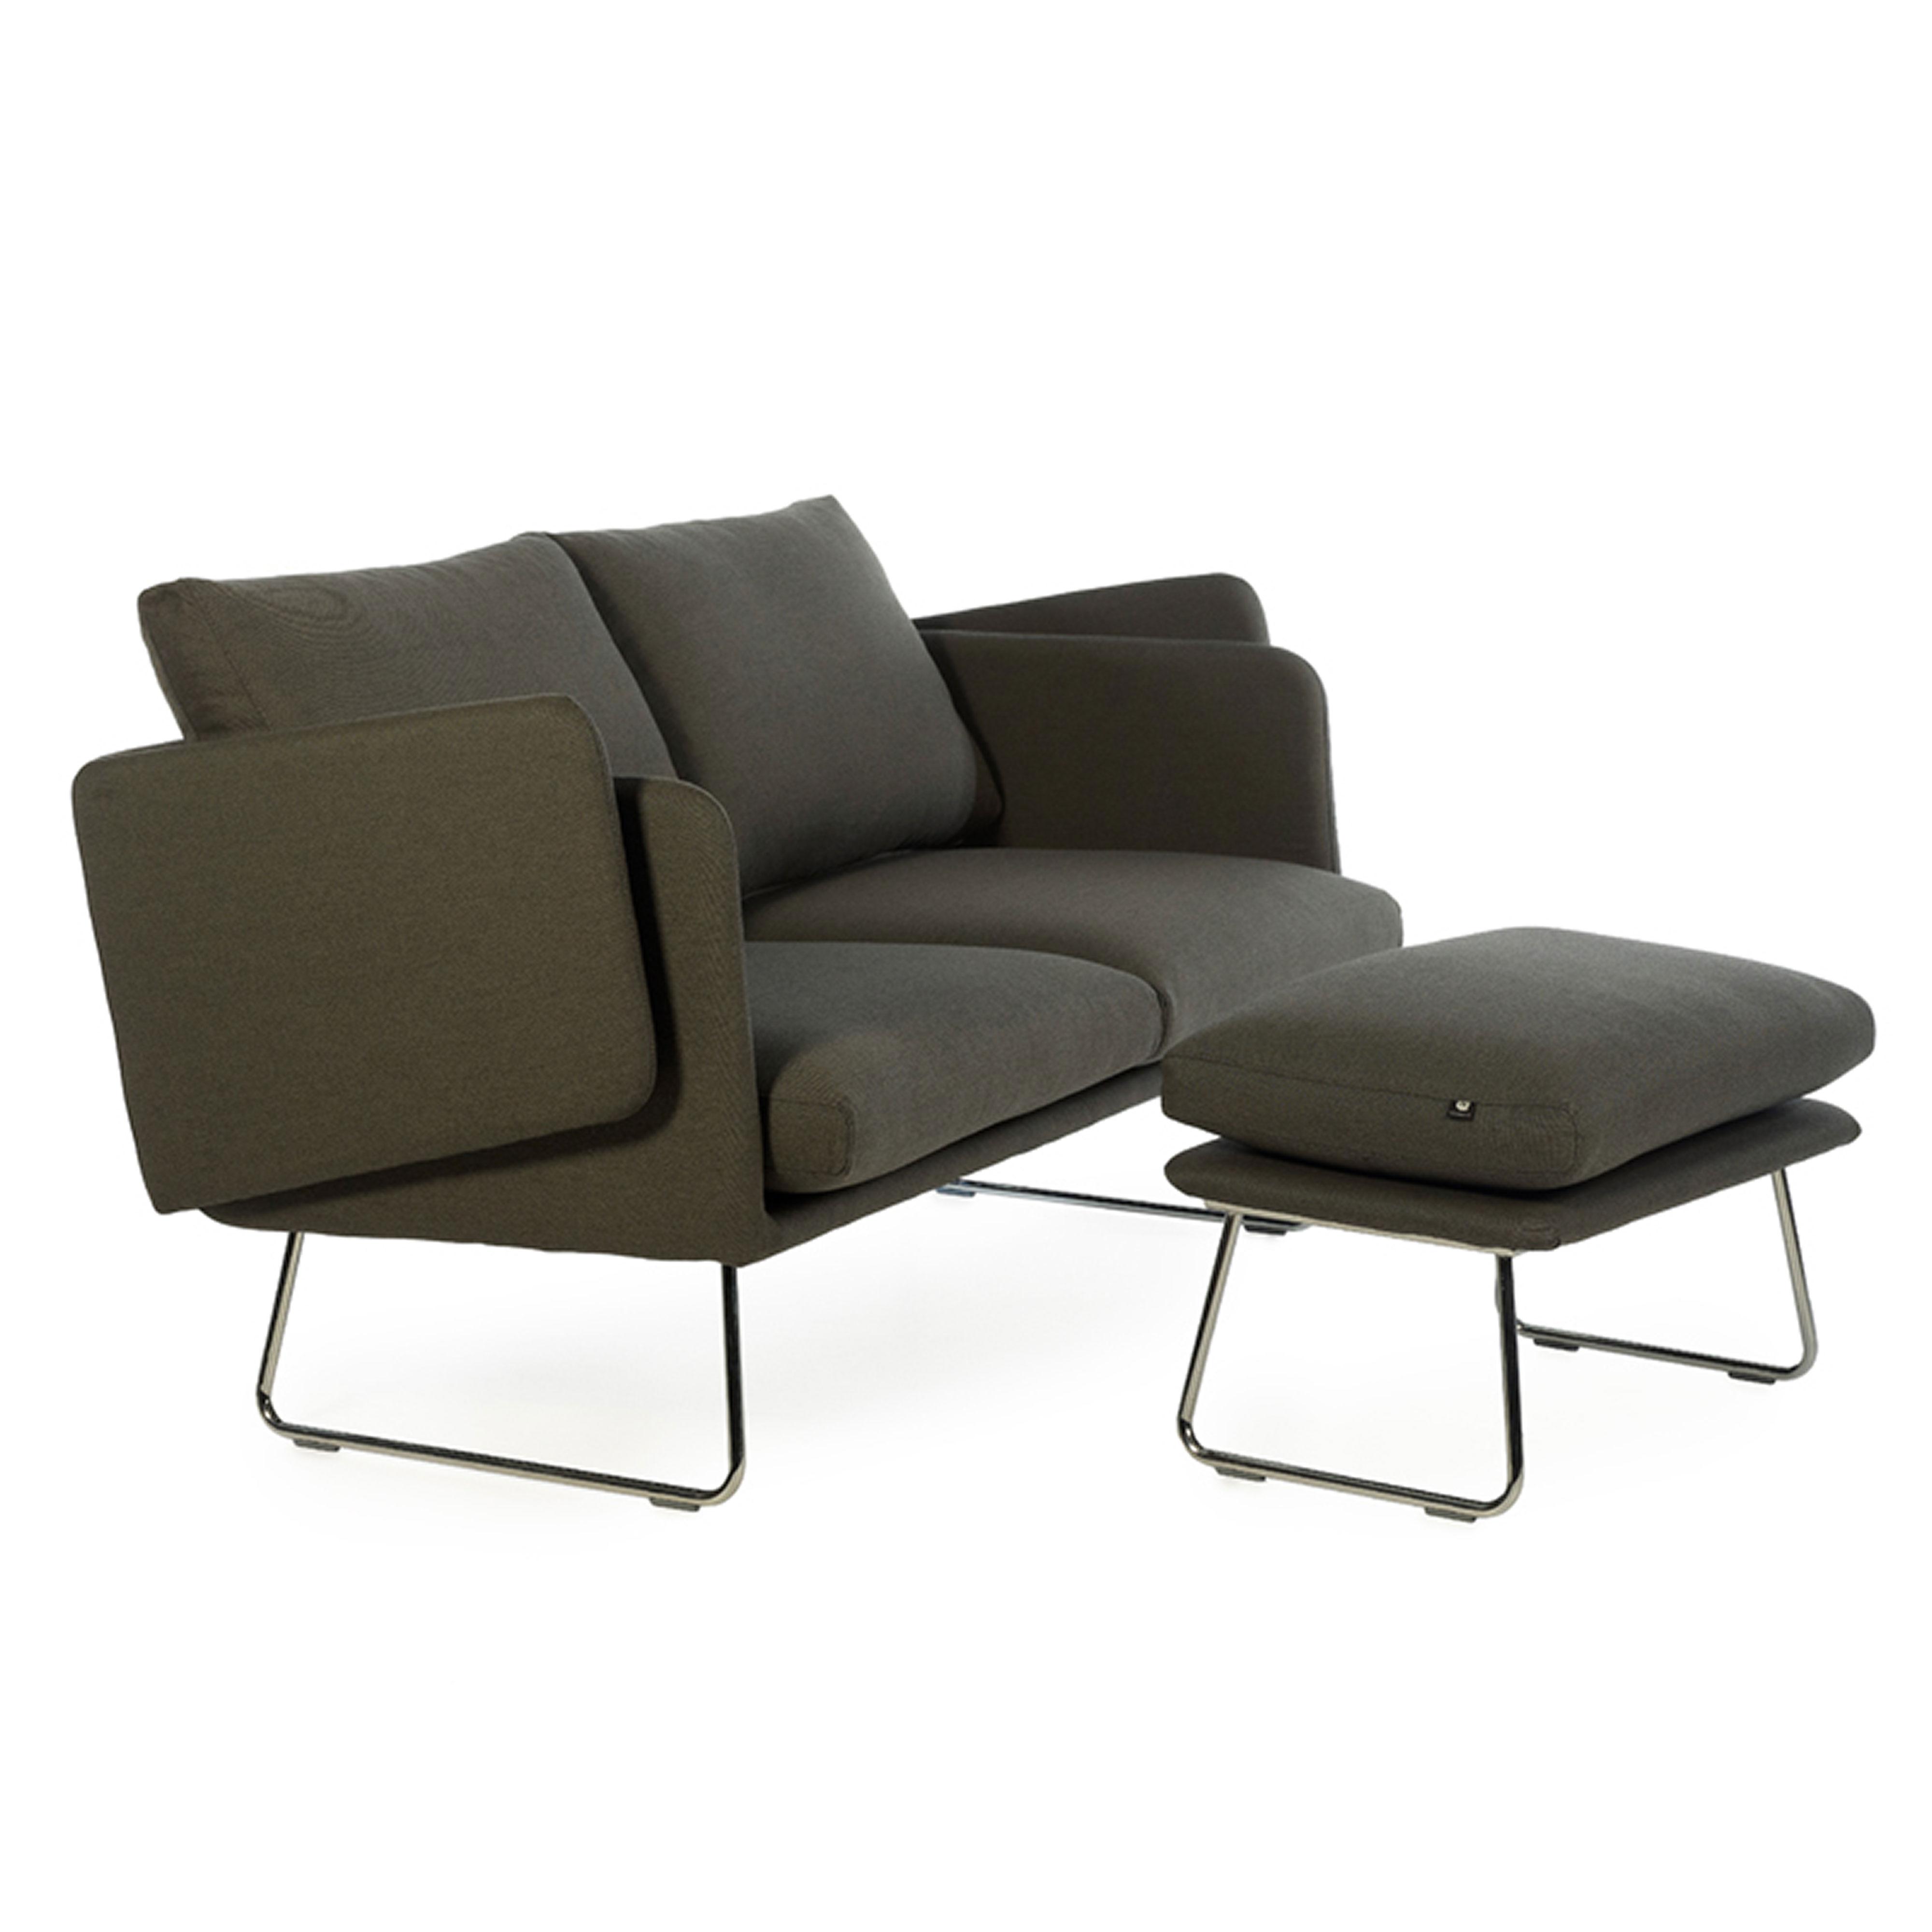 "Sofa ""Relax"" - Design SPONGY von RS Barcelona"